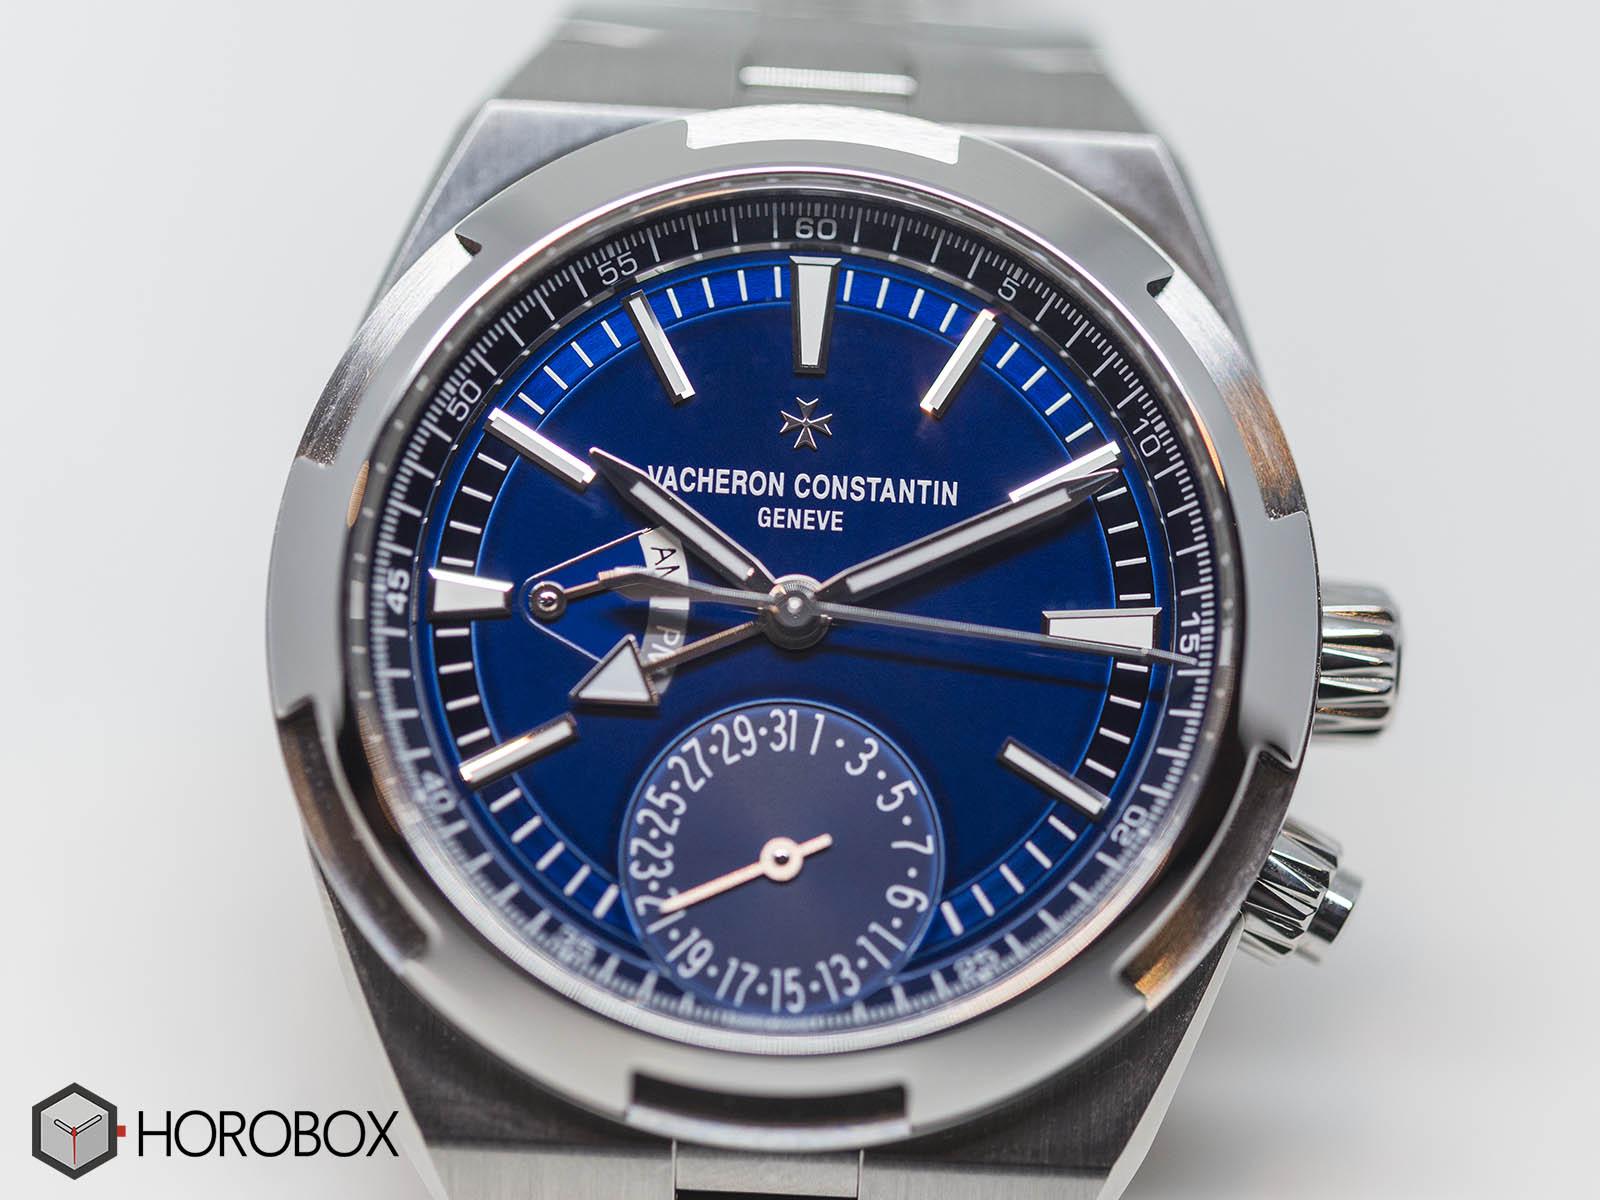 7900v110a-b334-Vacheron-Constantin-Overseas-Dual-Time-Sihh-2018-2.jpg